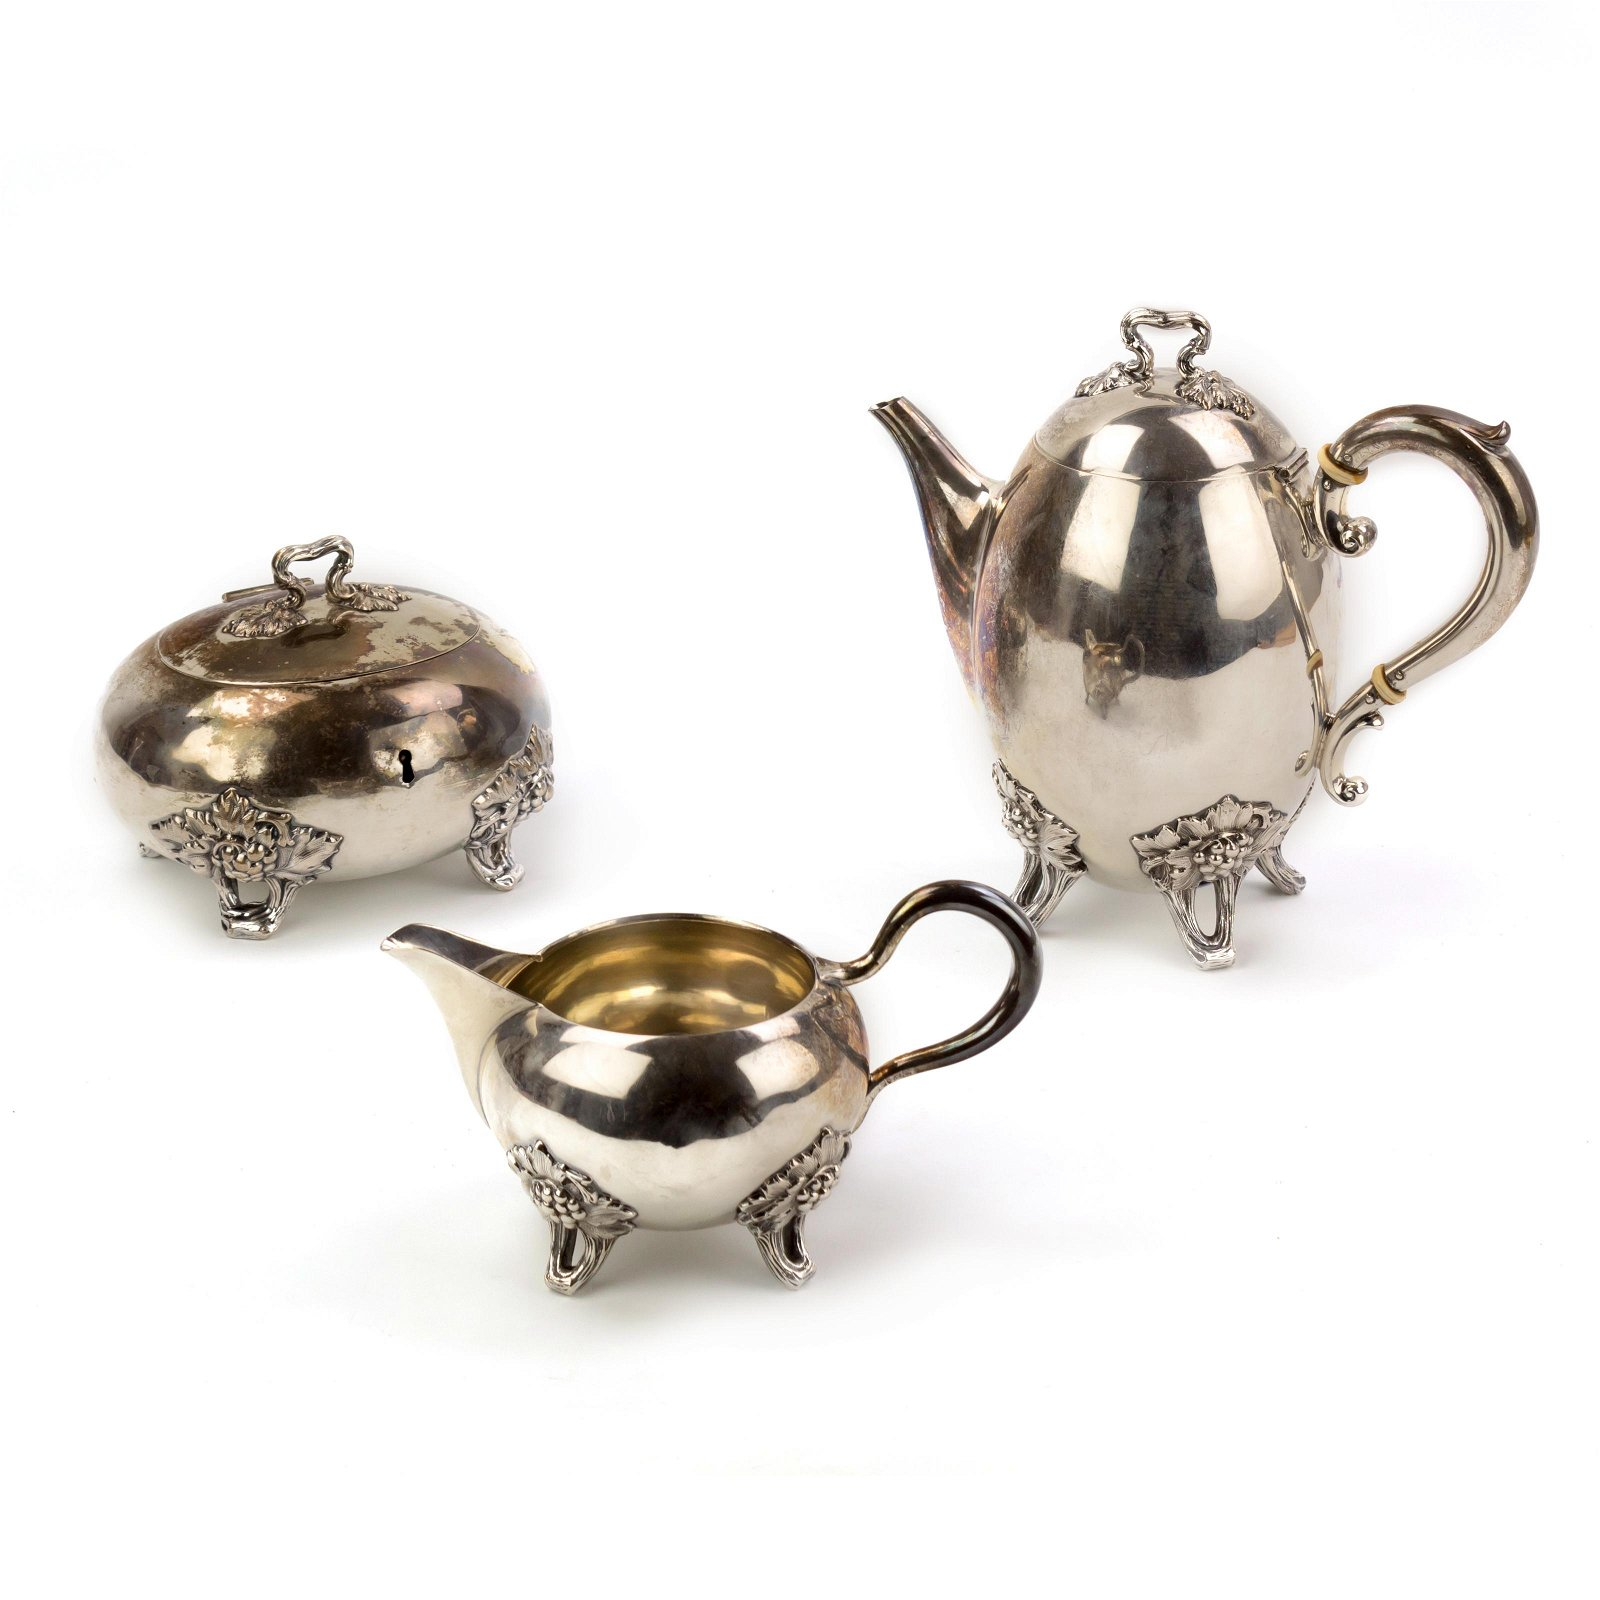 3 Pc Art Nouveau German 800 Silver Tea Set 1258 g.